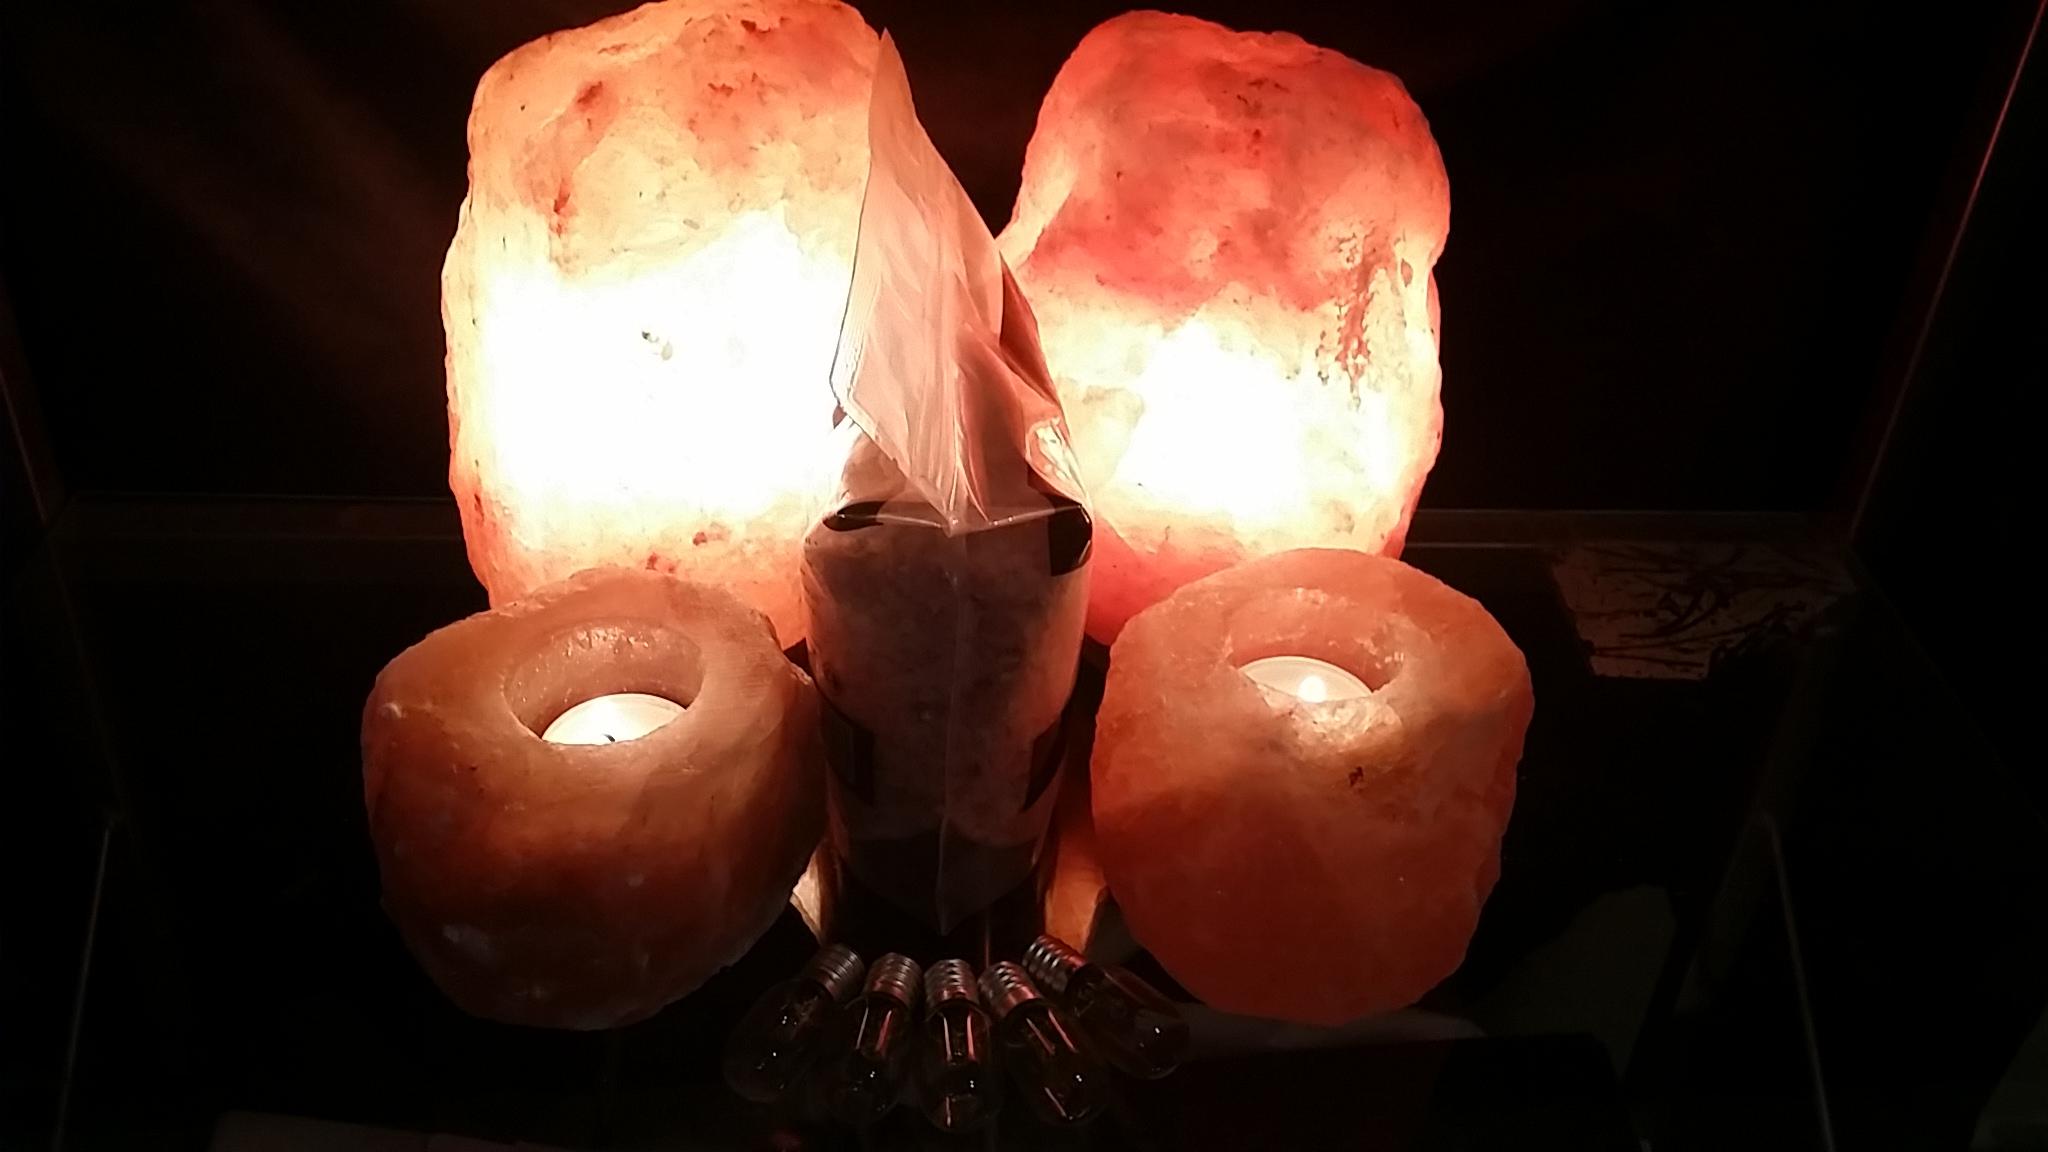 Salt Lamp Small Home Pack #2 - 2 x 2-3kg Lamps, 2 x Tea Lights, 1kg Salt, 5 spare globes